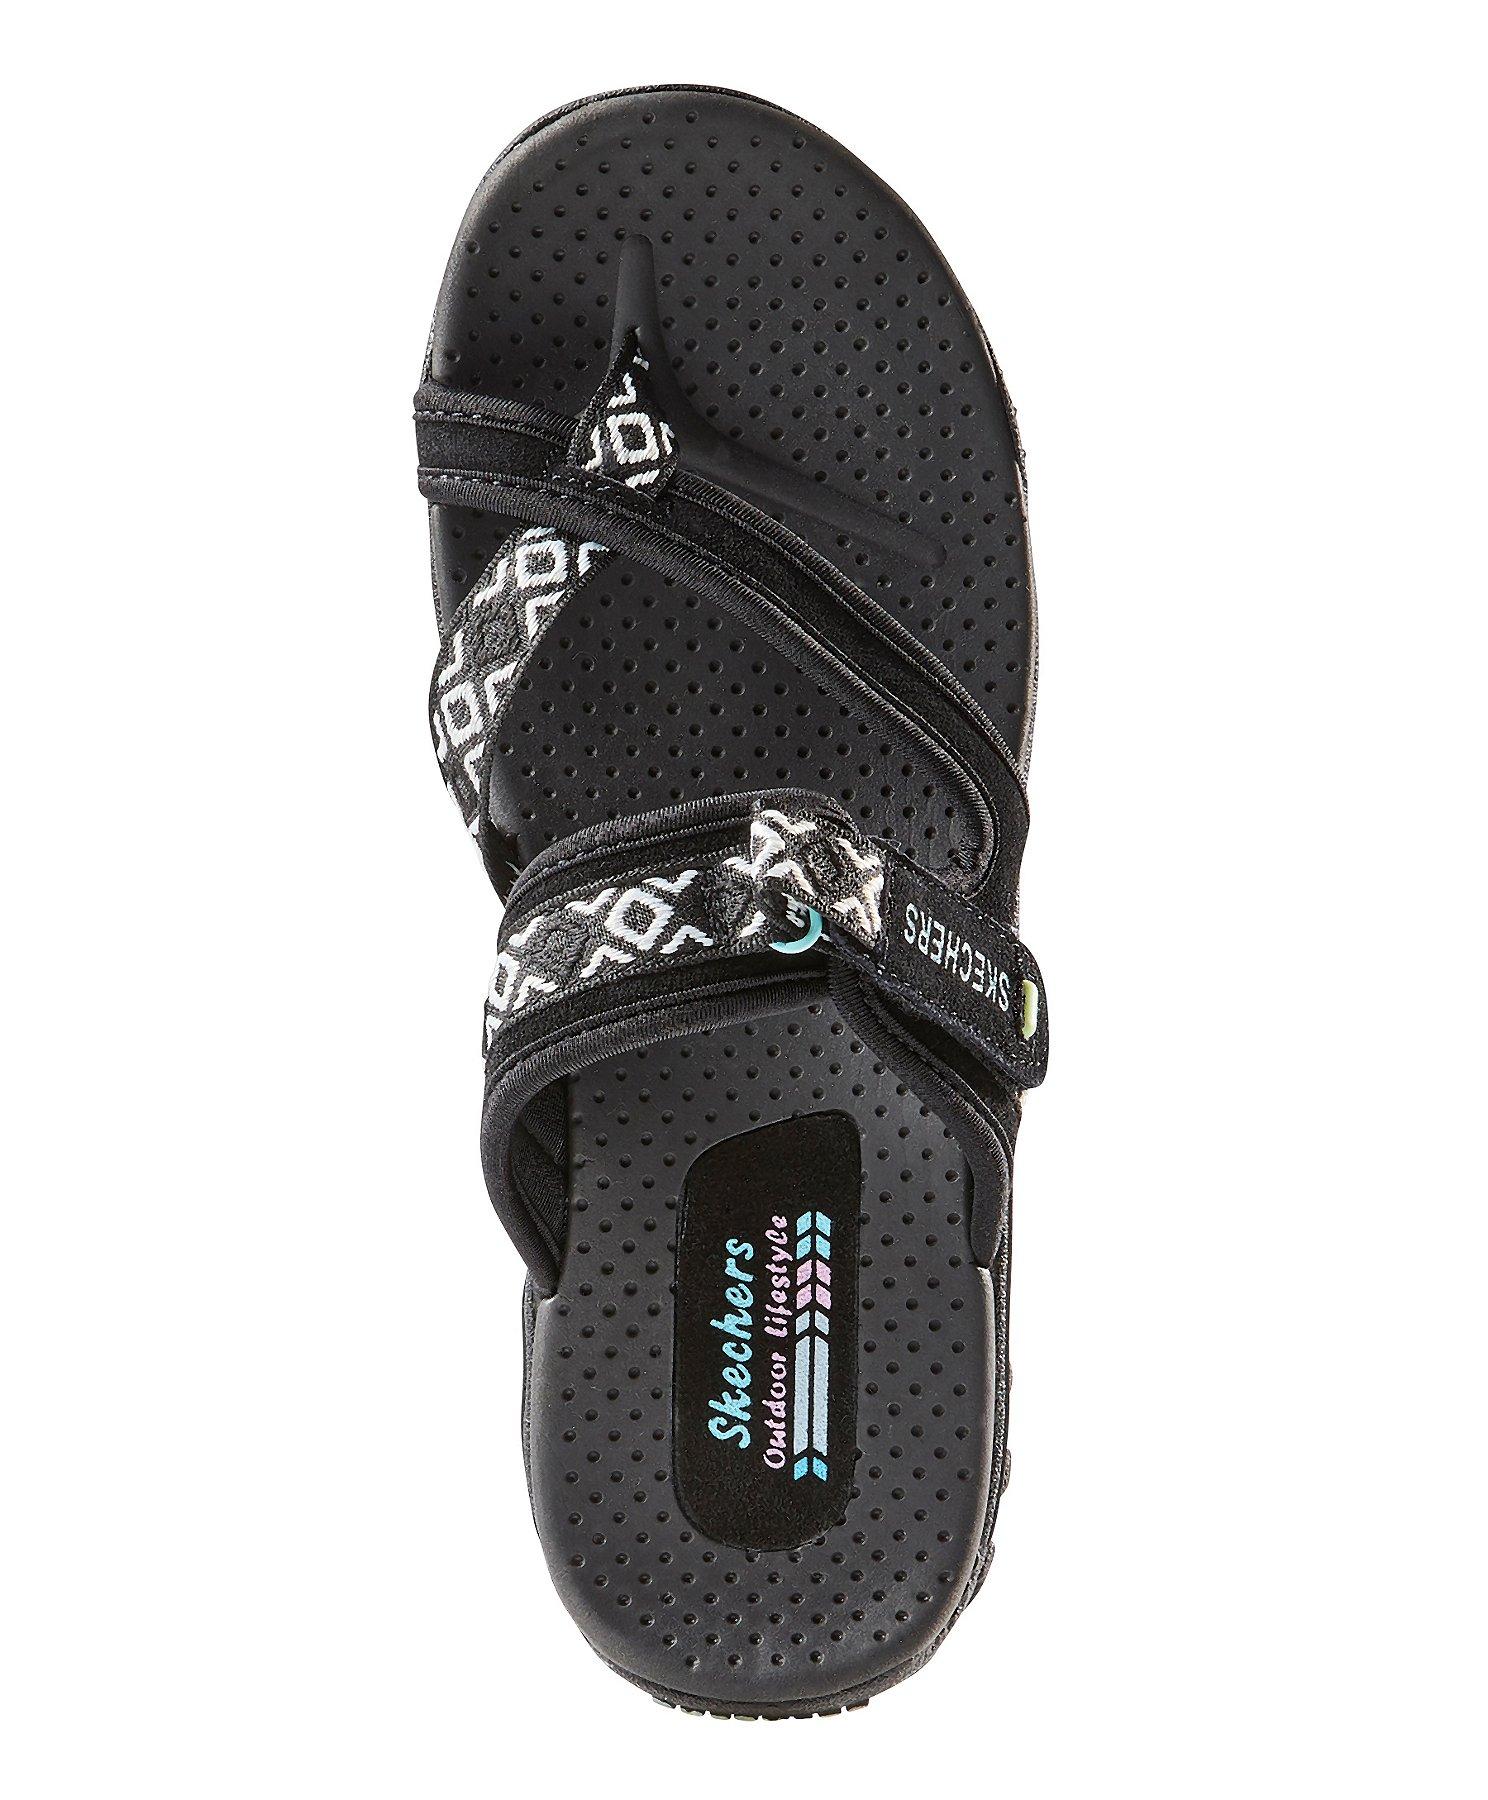 skechers hiking sandals femmes